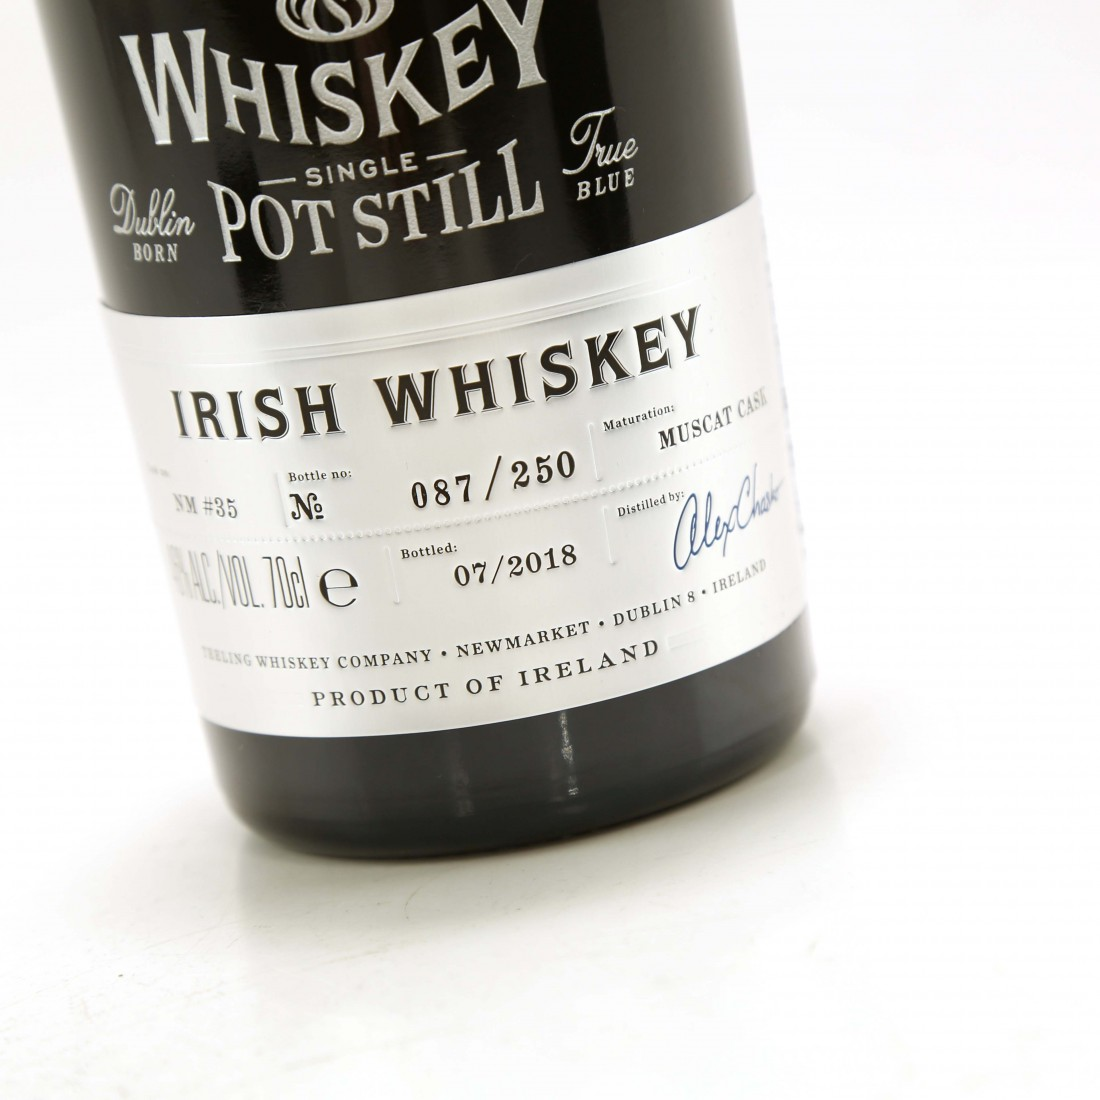 Teeling Celebratory Single Pot Still Whiskey / Bottle #087